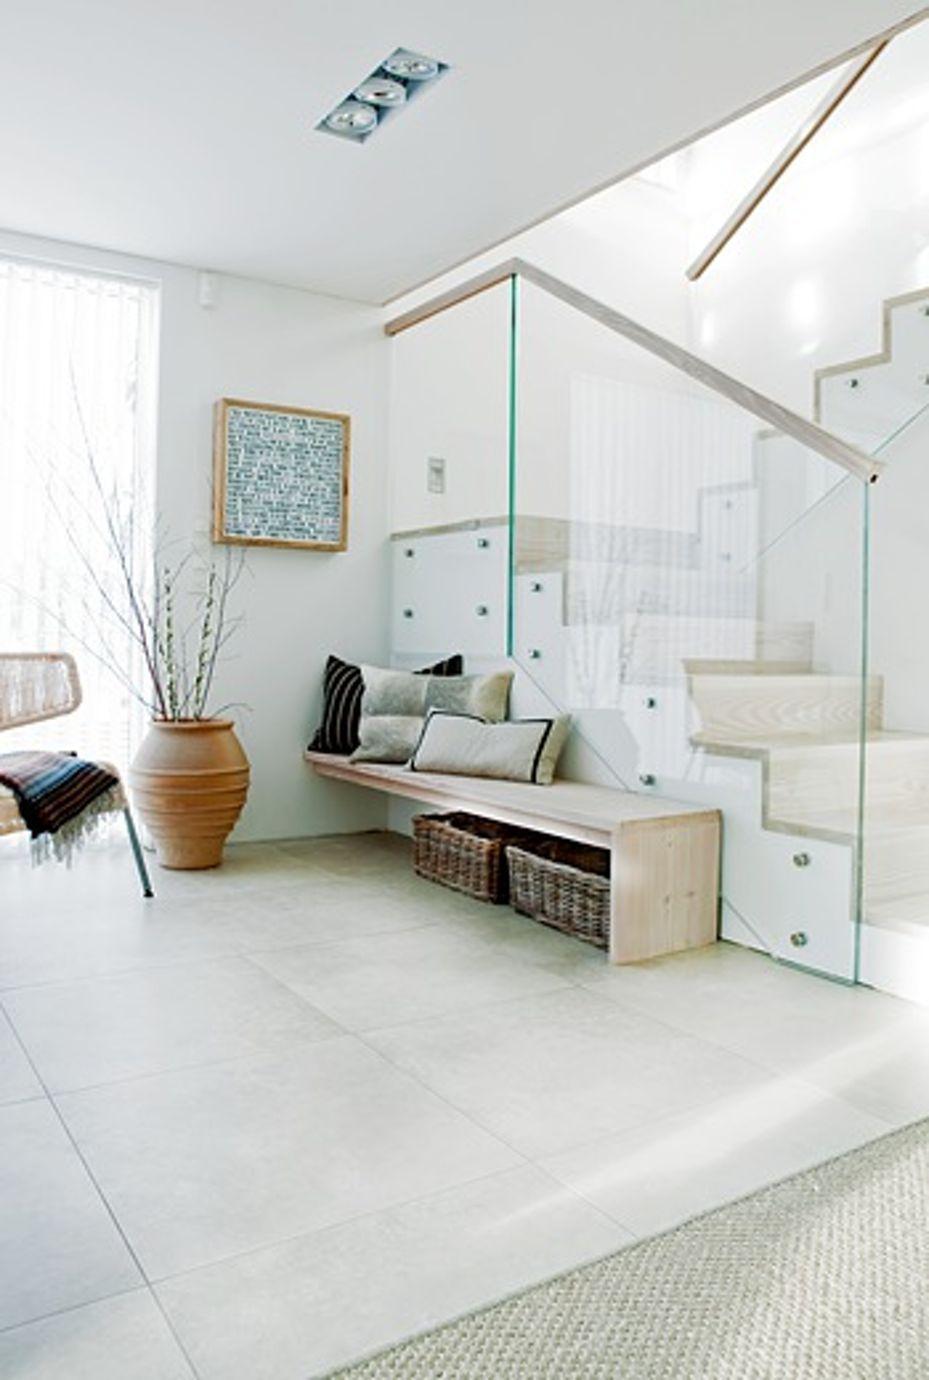 Modern hallway storage ideas  Lyst inngangsparti  Gang MuP  Pinterest  Hall Interiors and